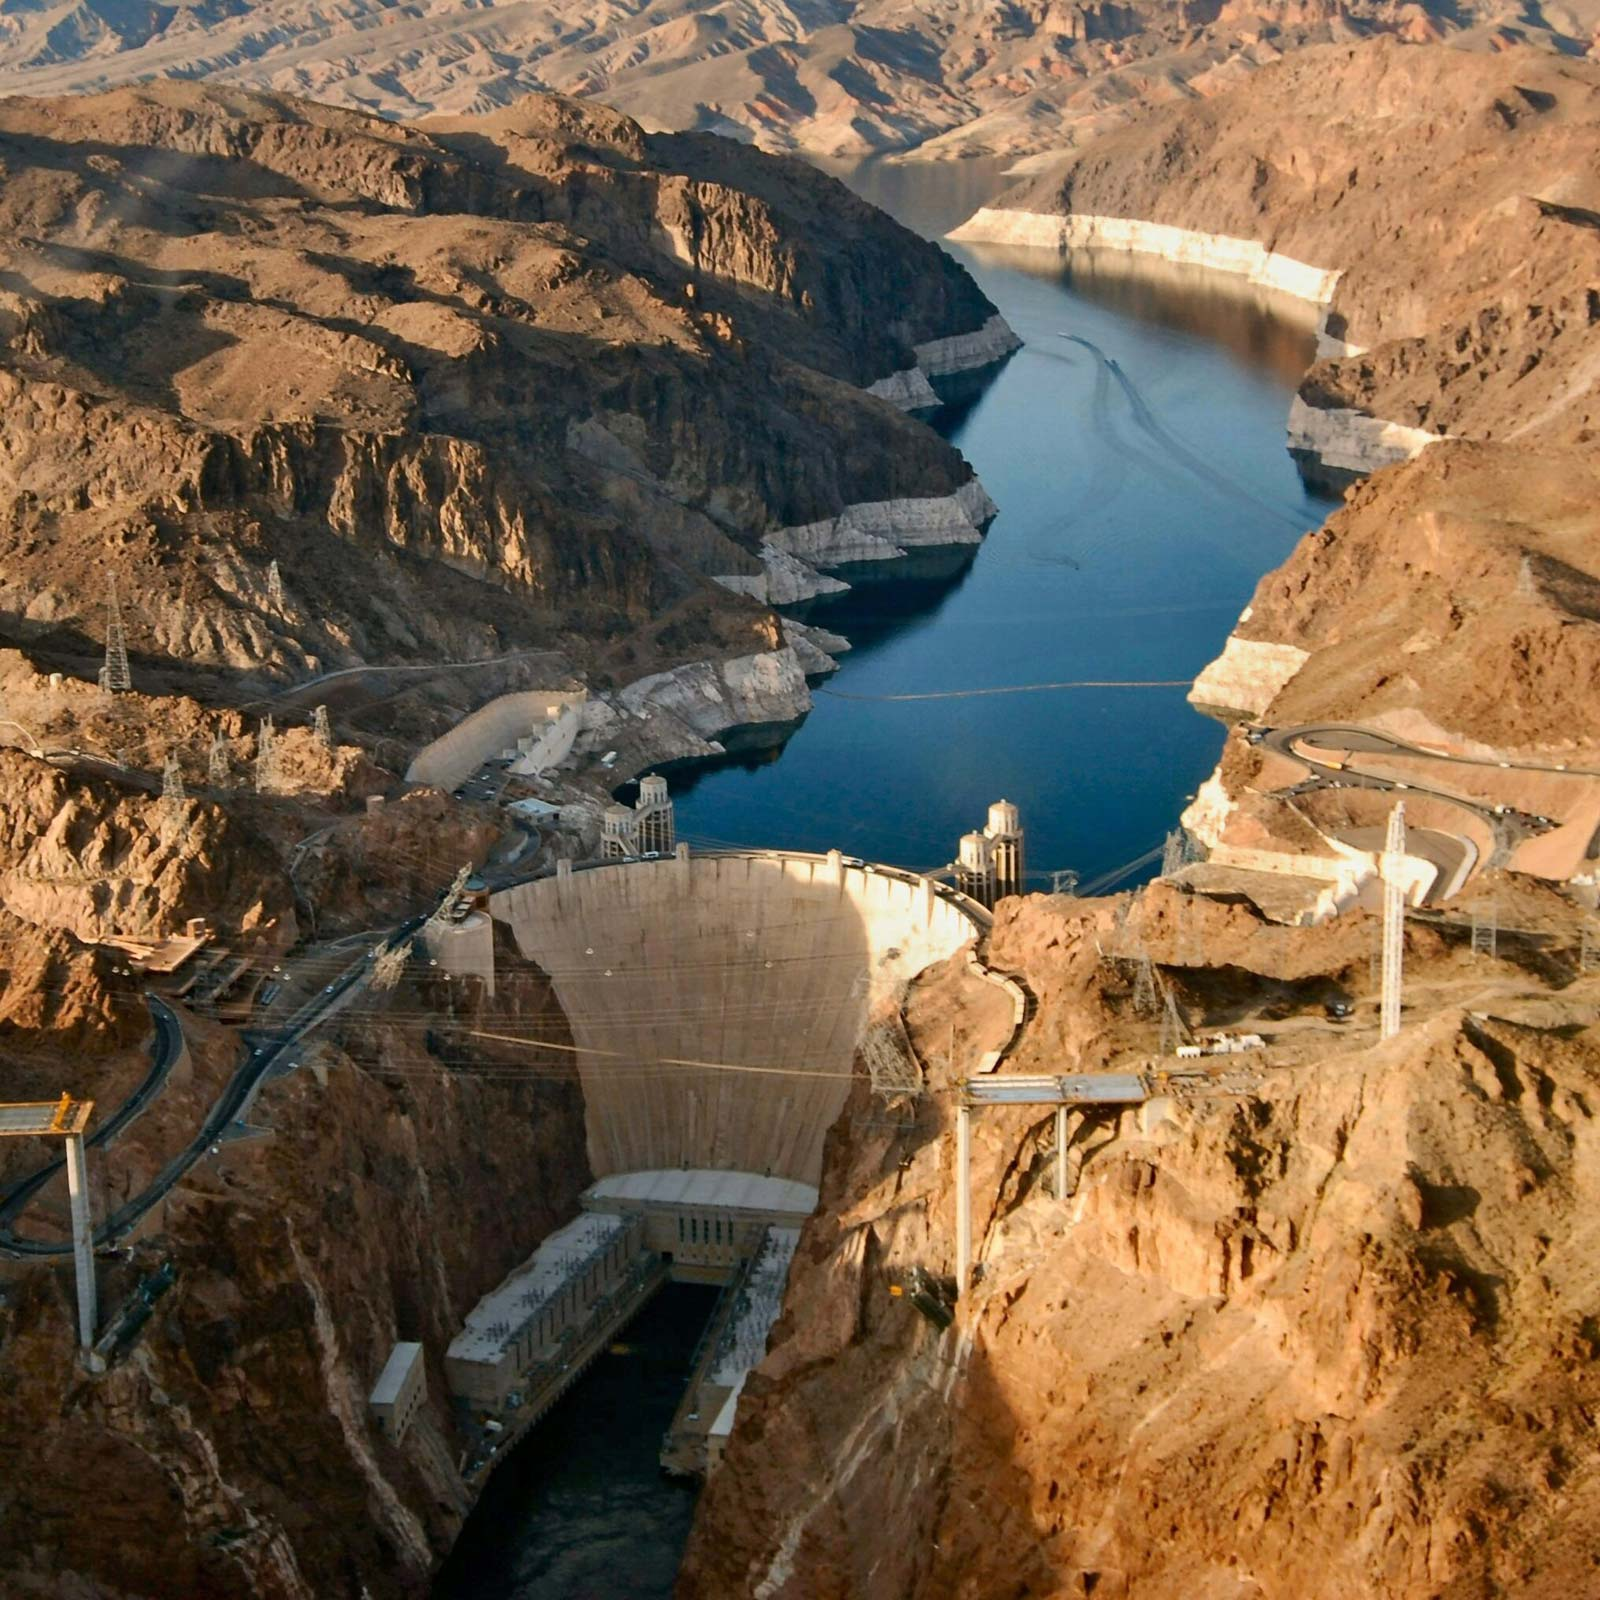 Hoover-Dam-border-Colorado-River-Arizona-Nevada.jpg